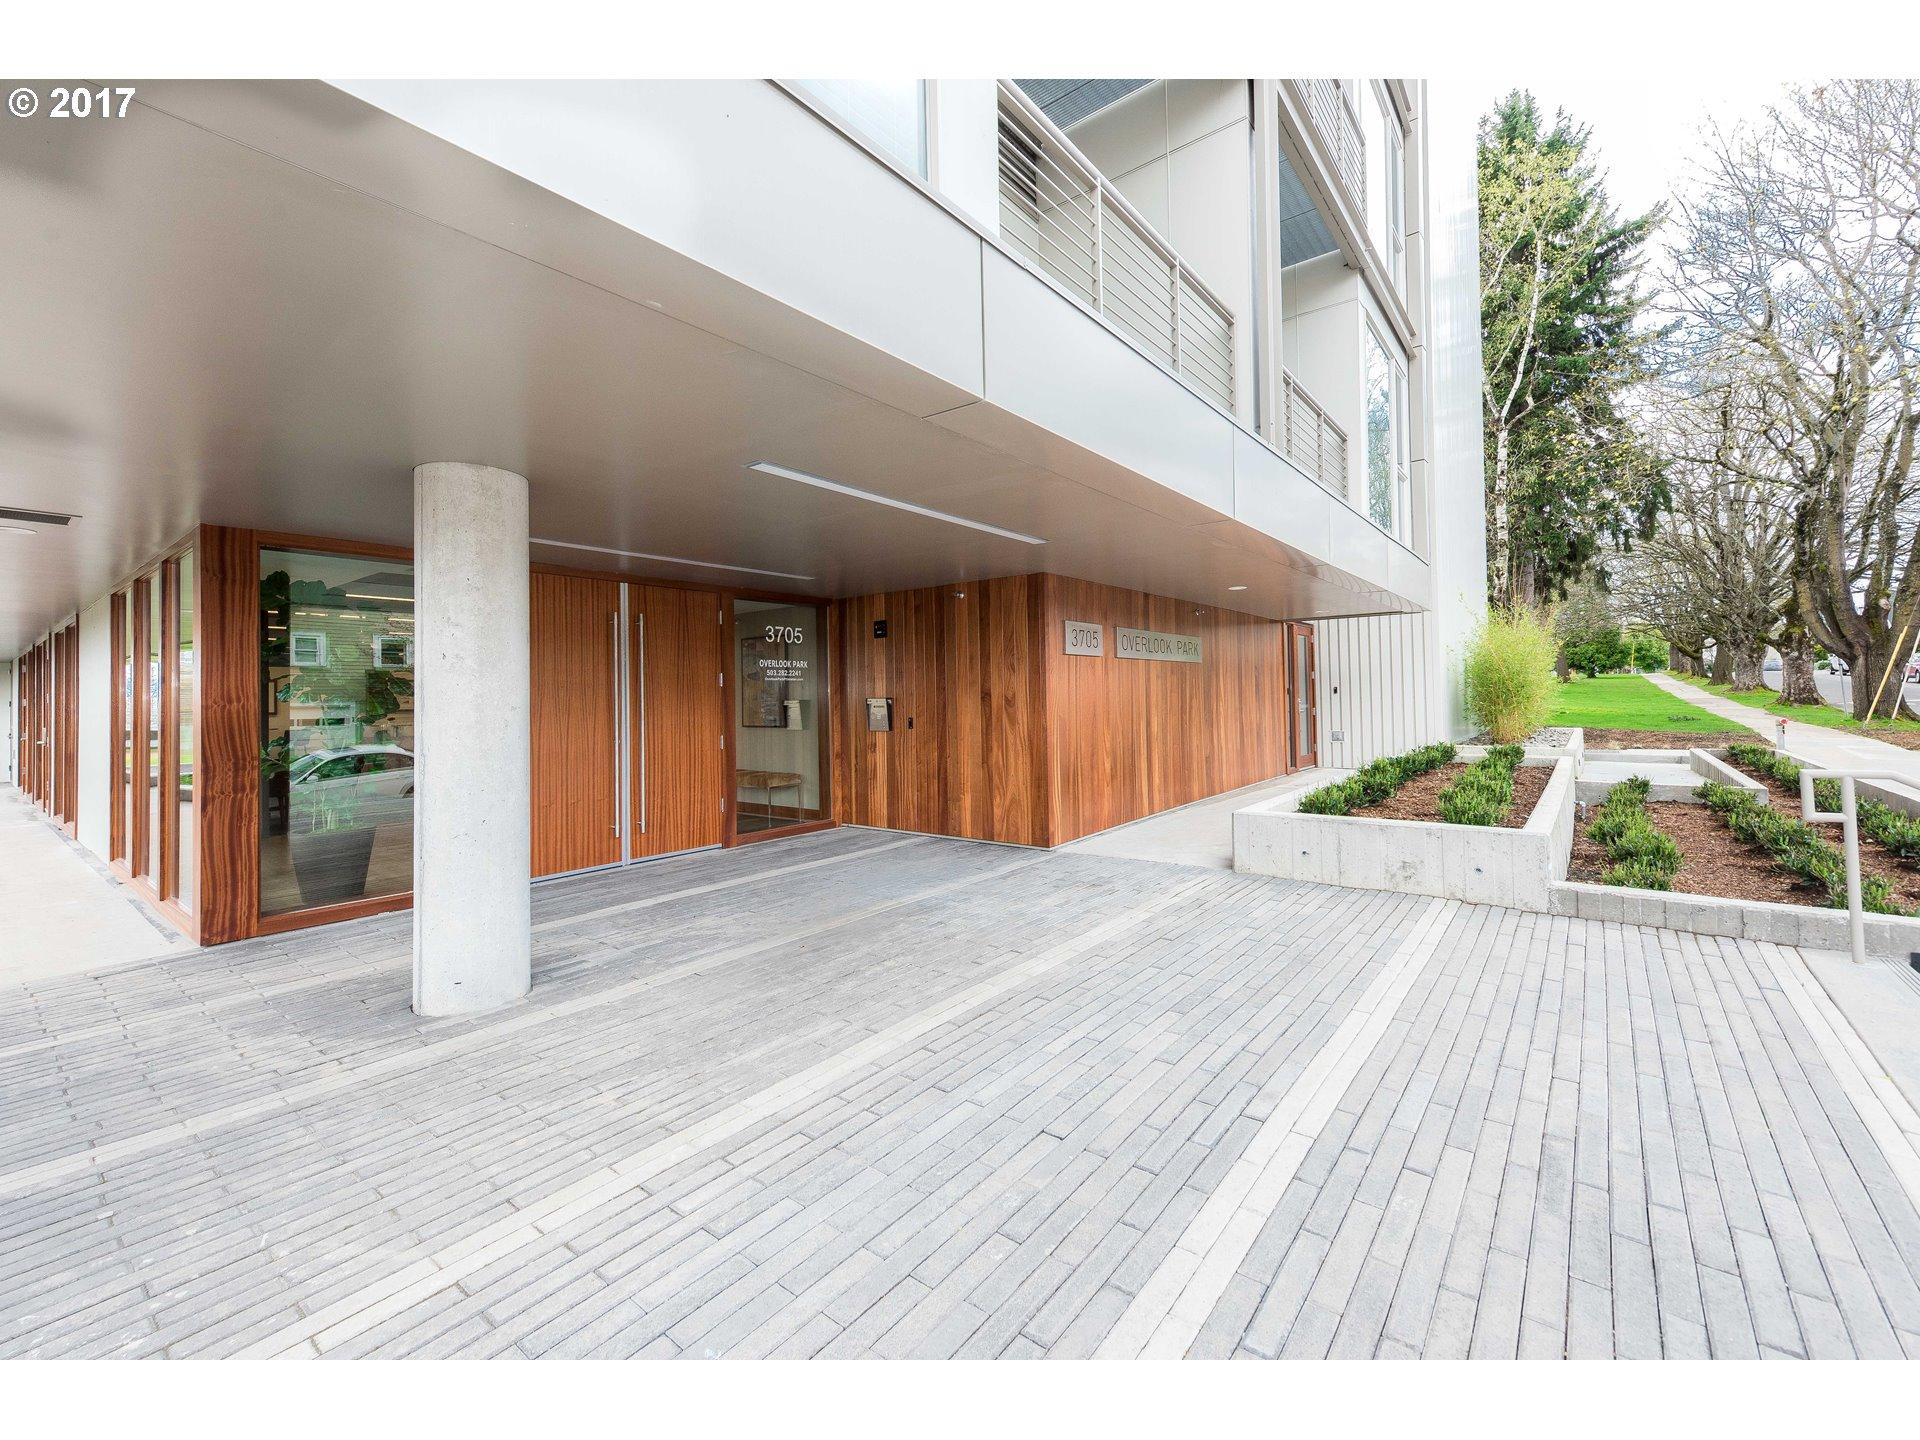 3705 N Overlook BLVD 209, Portland, OR 97280